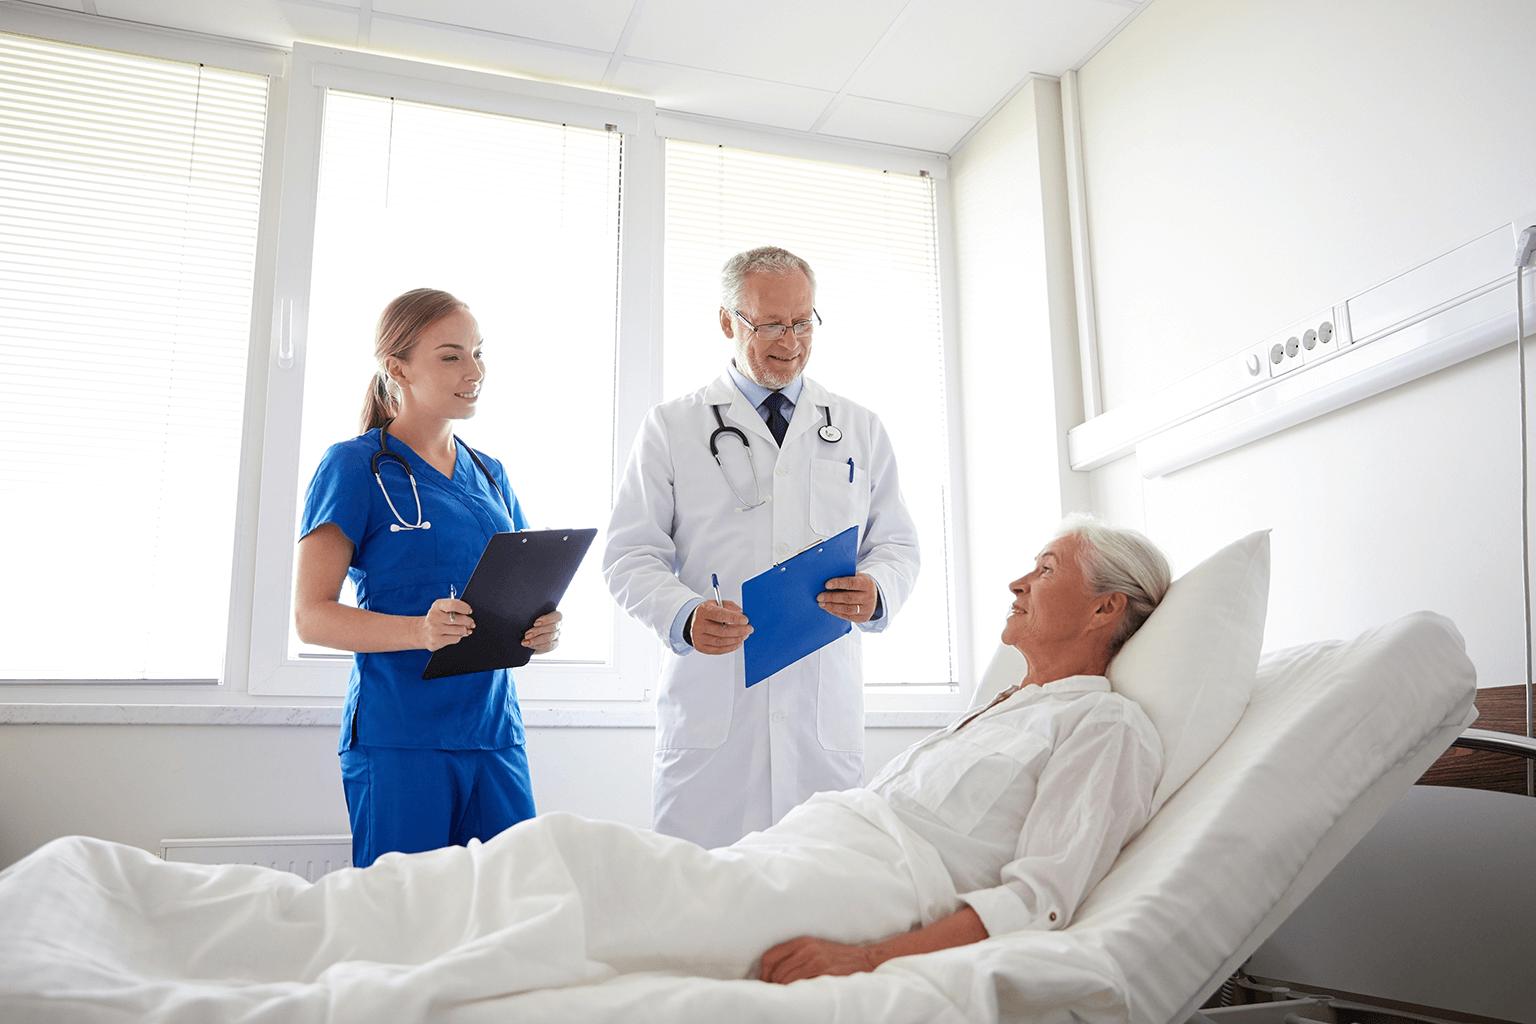 Standardizing sepsis protocols across settings optimizes sepsis prevention